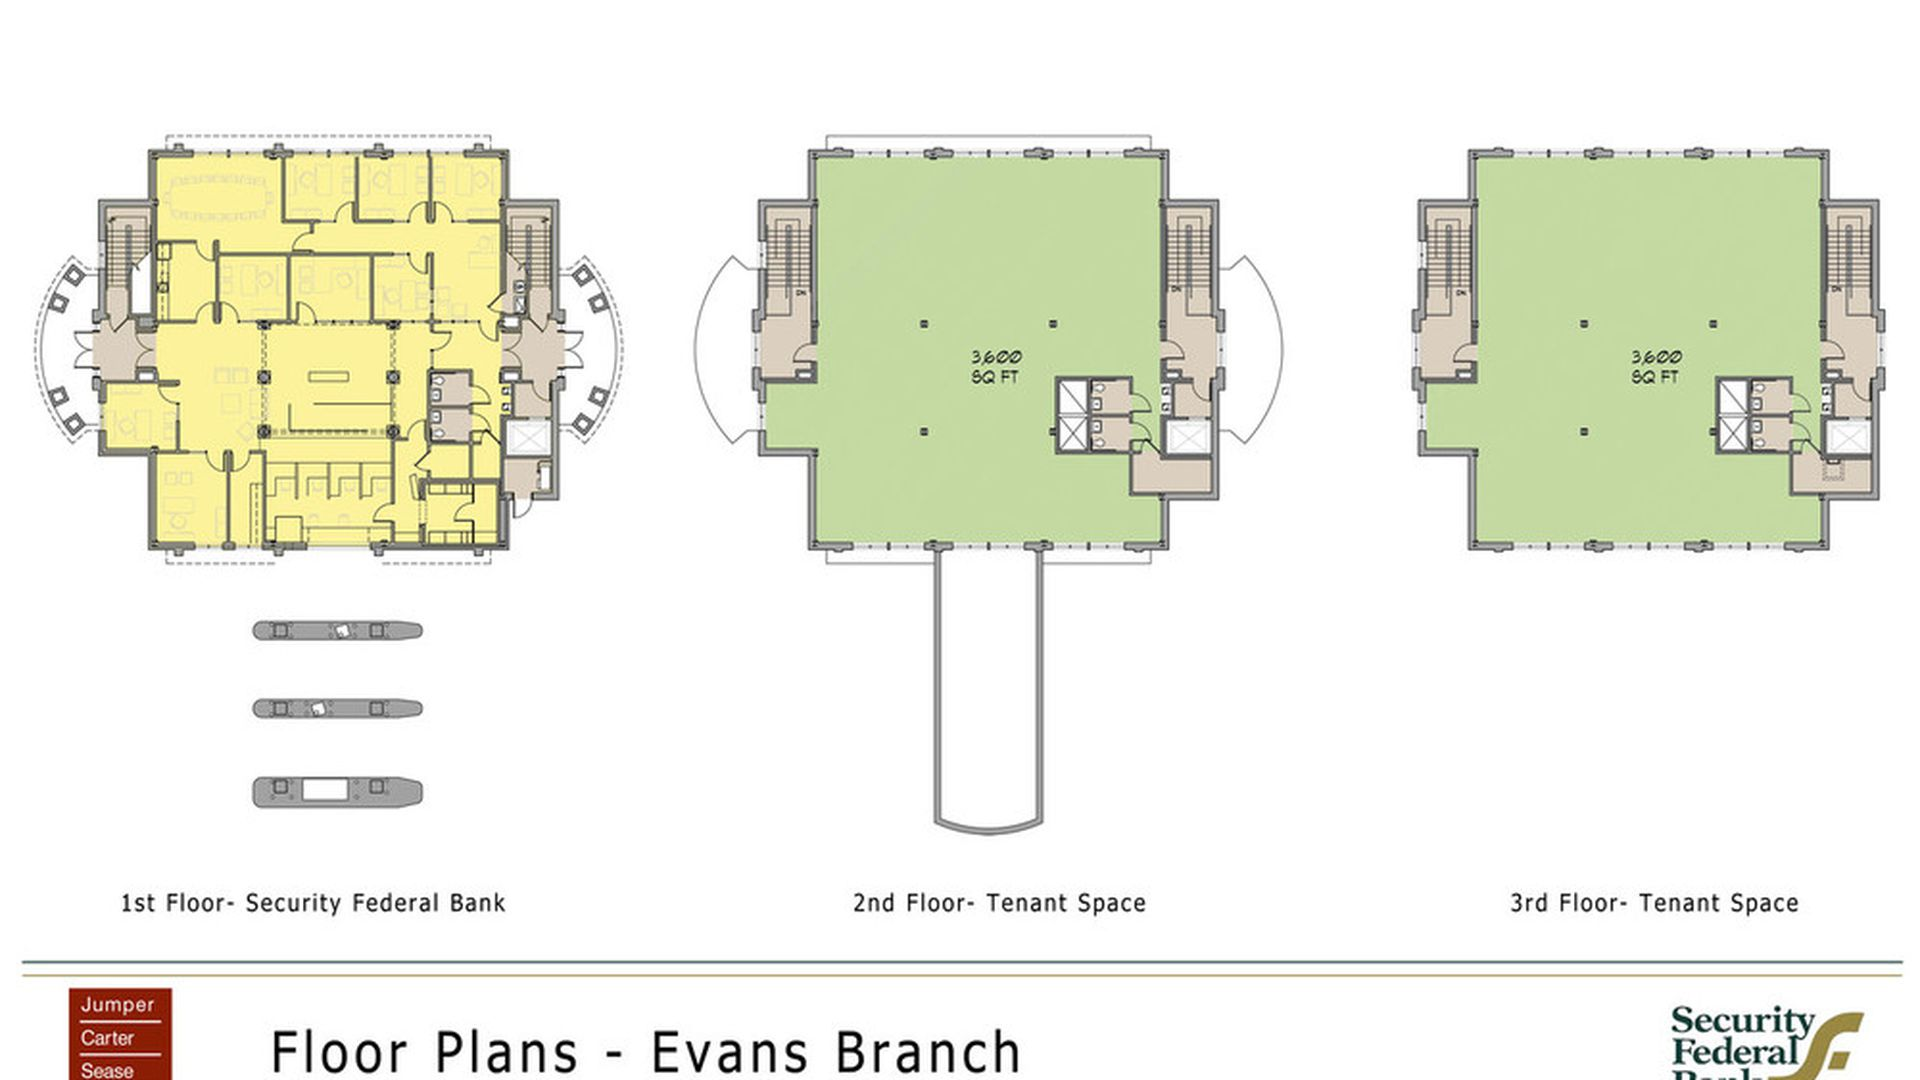 5133 Washington Road, Evans, GA 30809 United States   Office